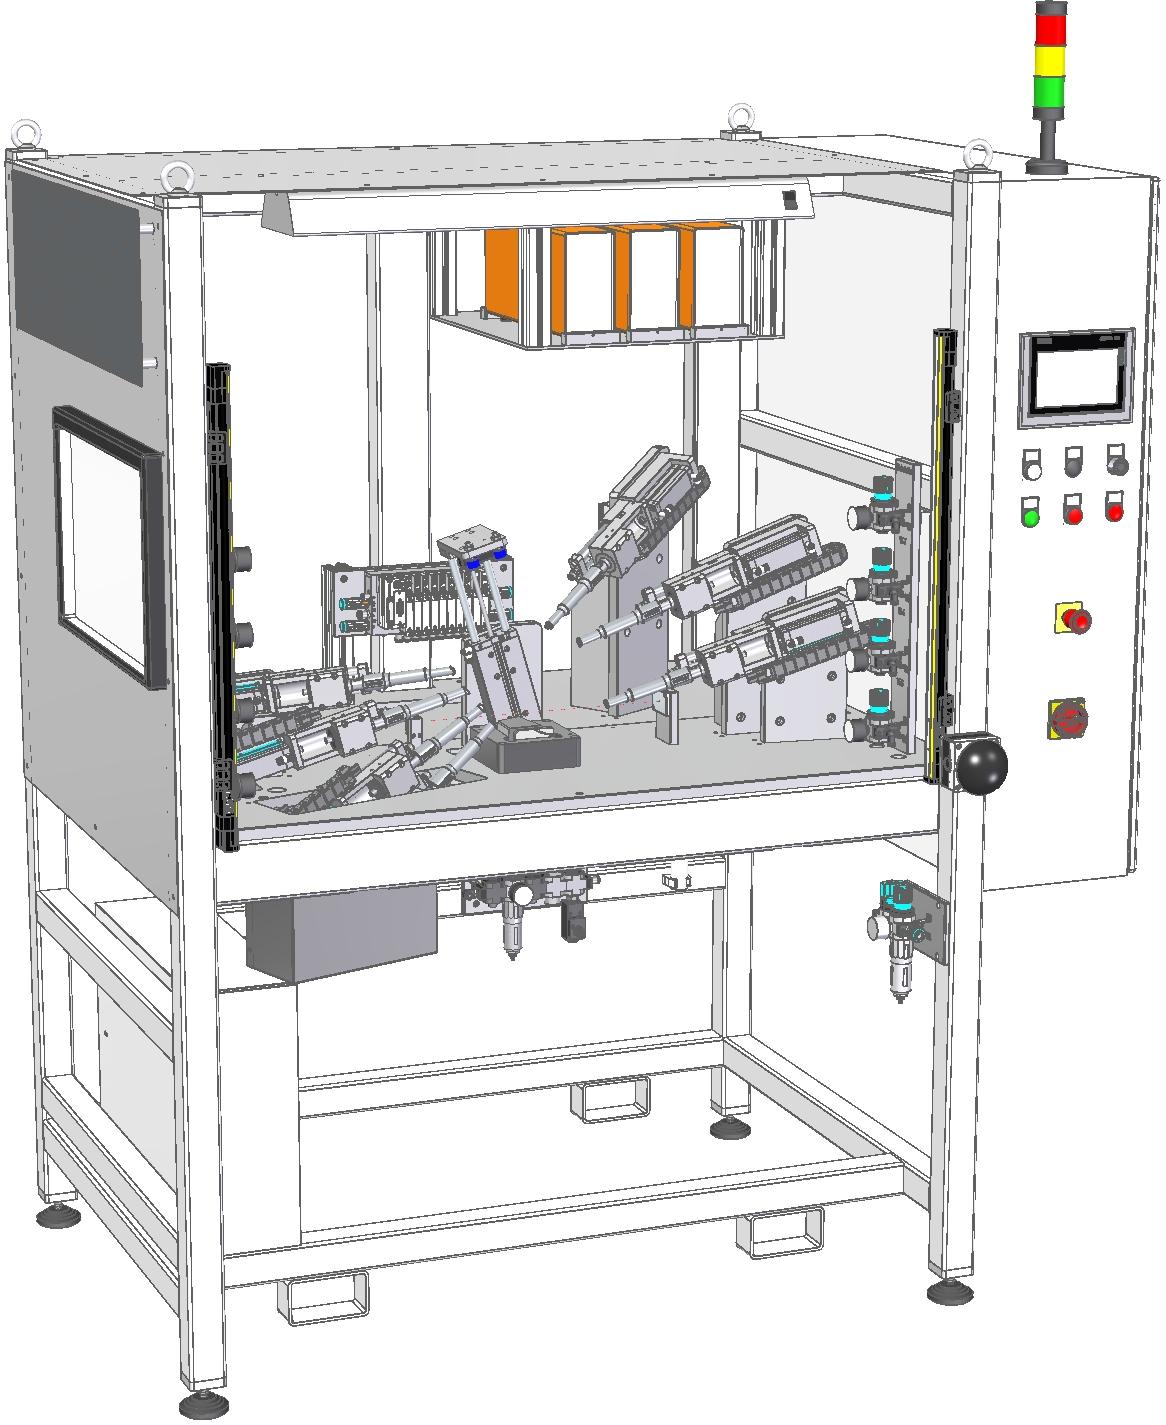 Products Maschinen Technik Vogt Gmbh Ultrasonic Welding Diagram Machine For The Automotive Industry